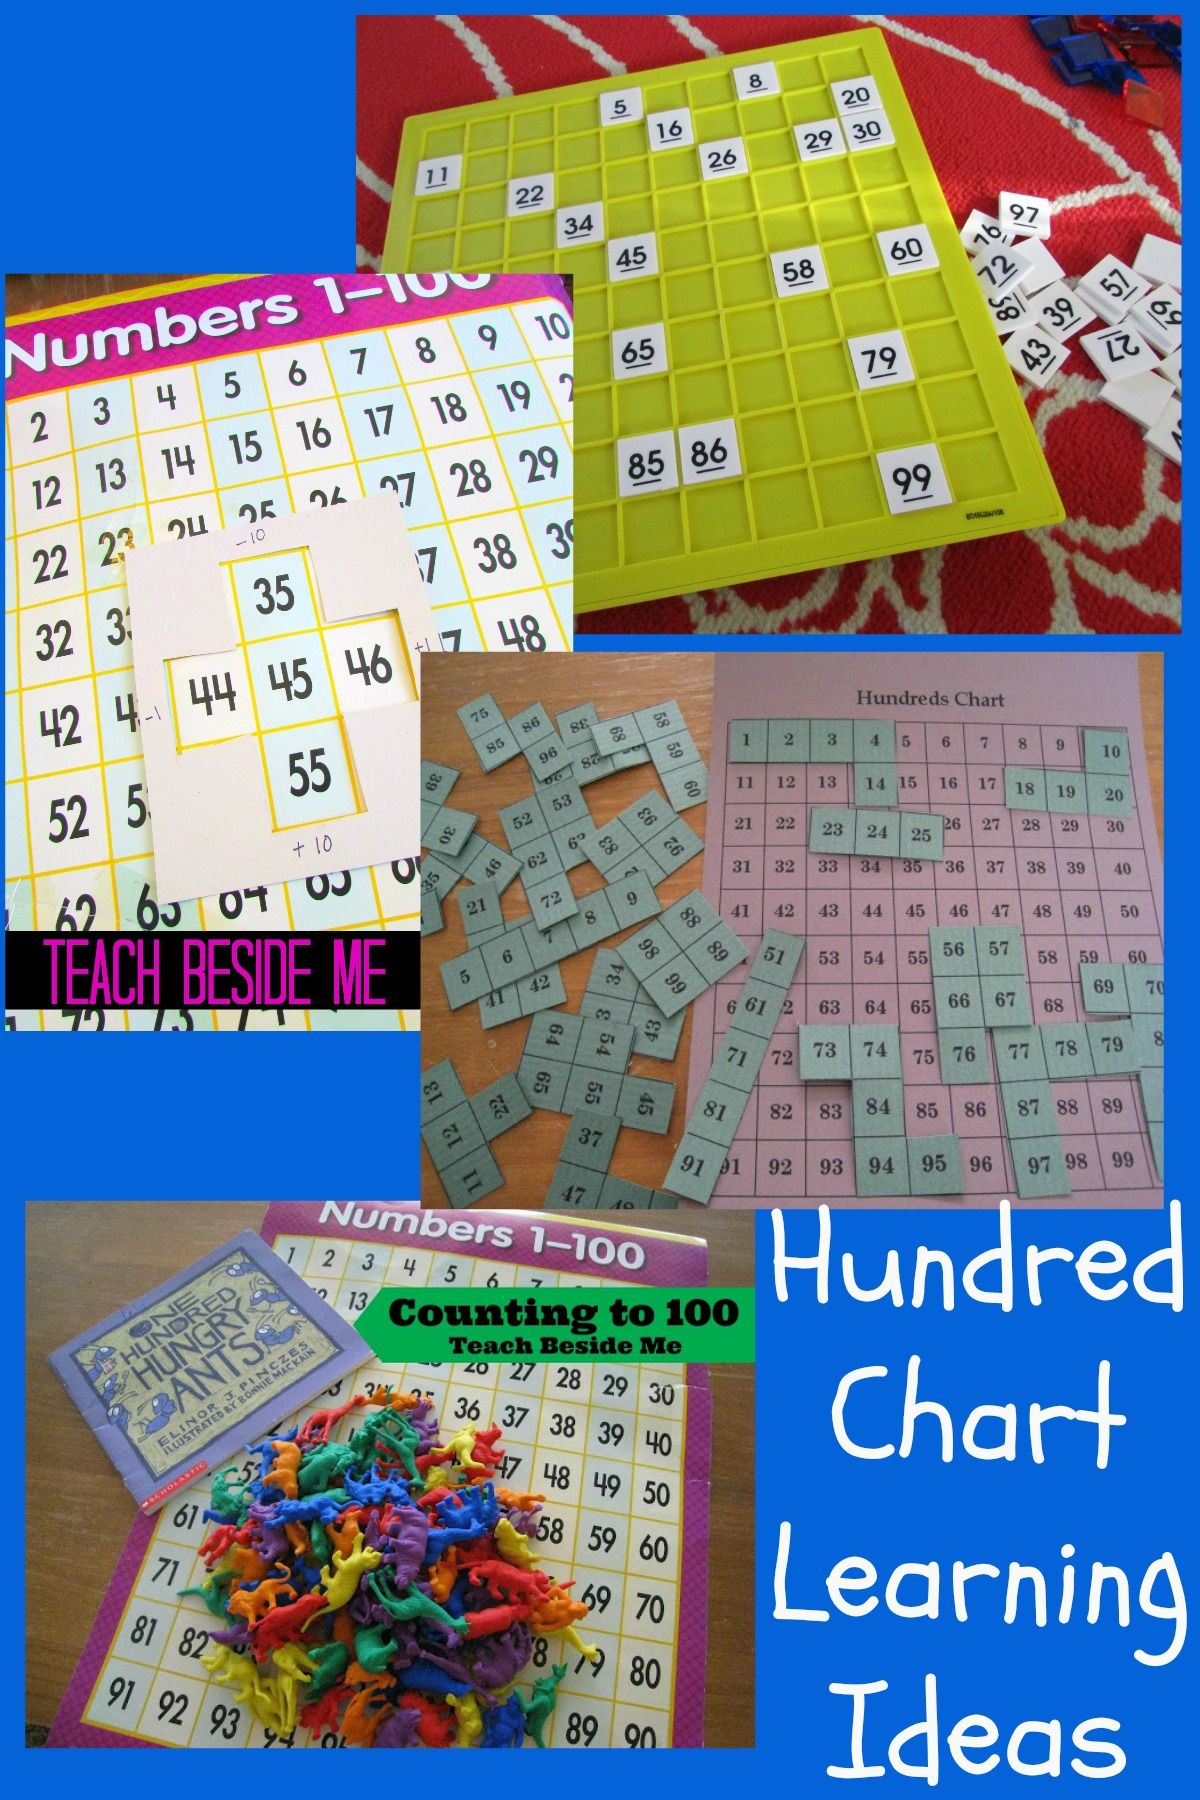 Hundred Chart Learning Ideas